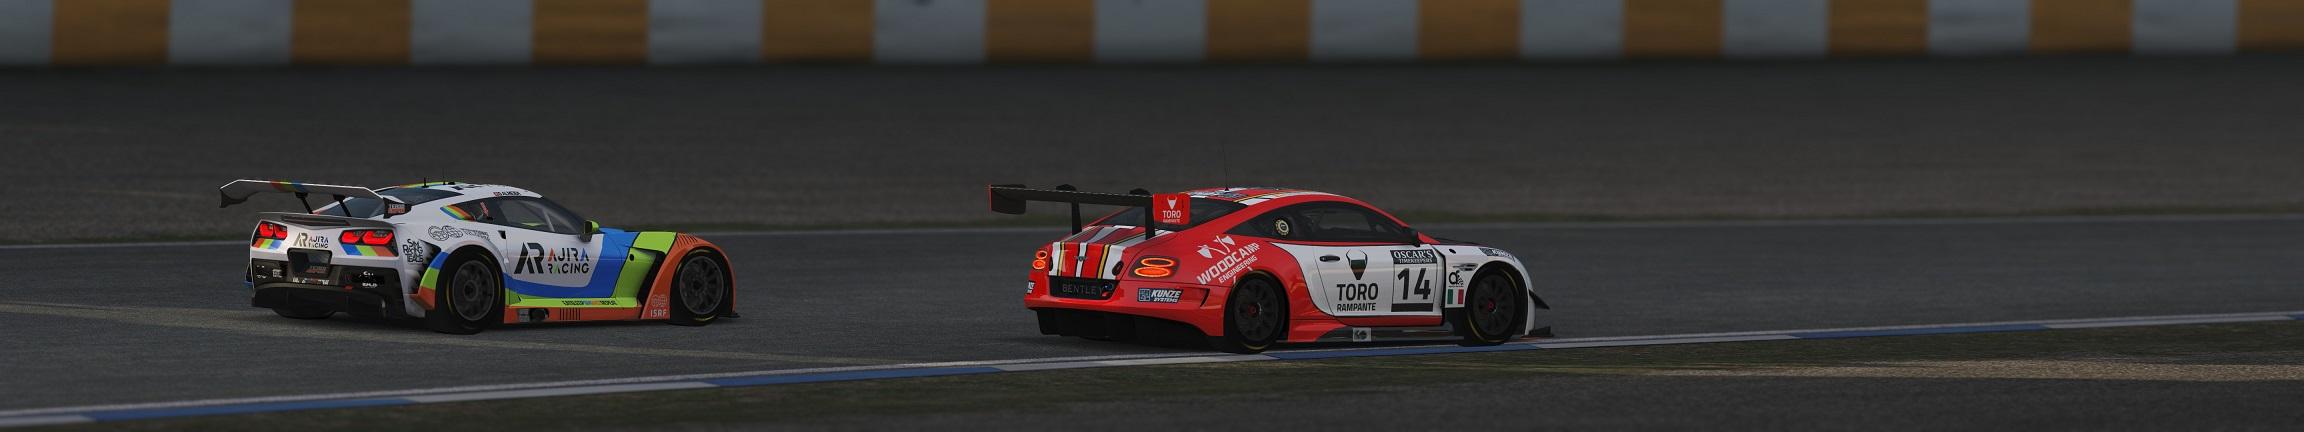 5a rF2 GT3 at PORTUGAL GT vette bentley copy.jpg